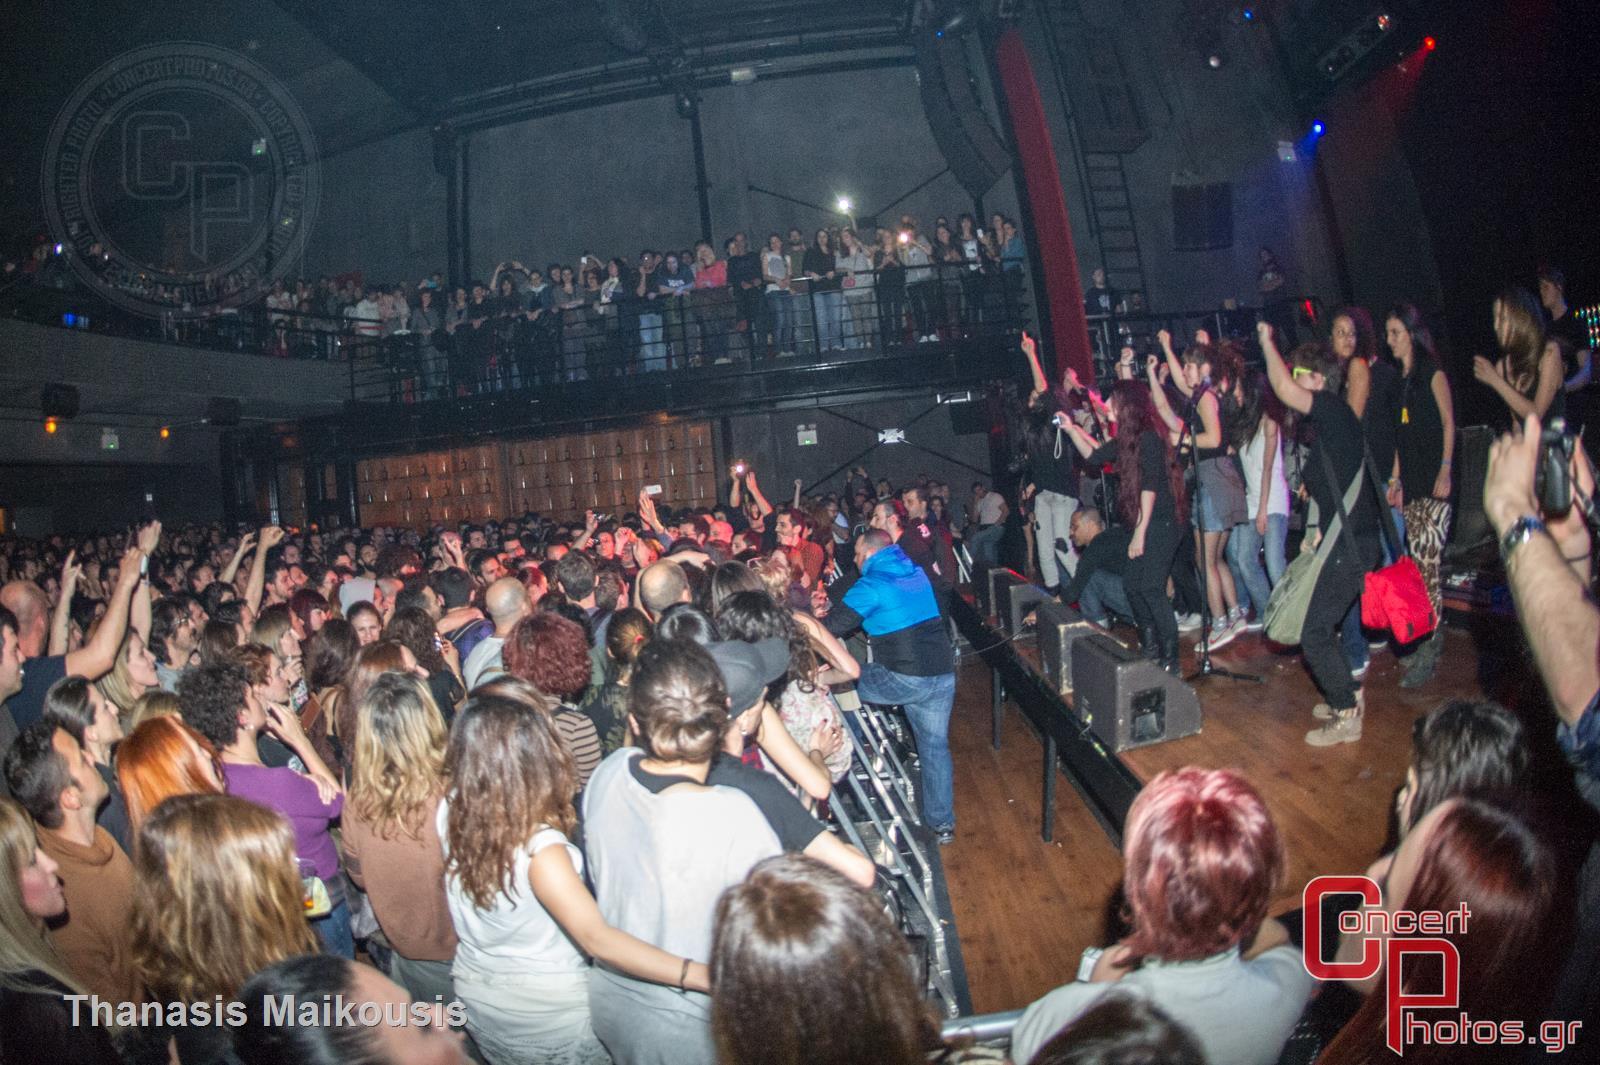 Tricky - Spectralfire-Tricky - Spectralfire photographer: Thanasis Maikousis - concertphotos_-3992